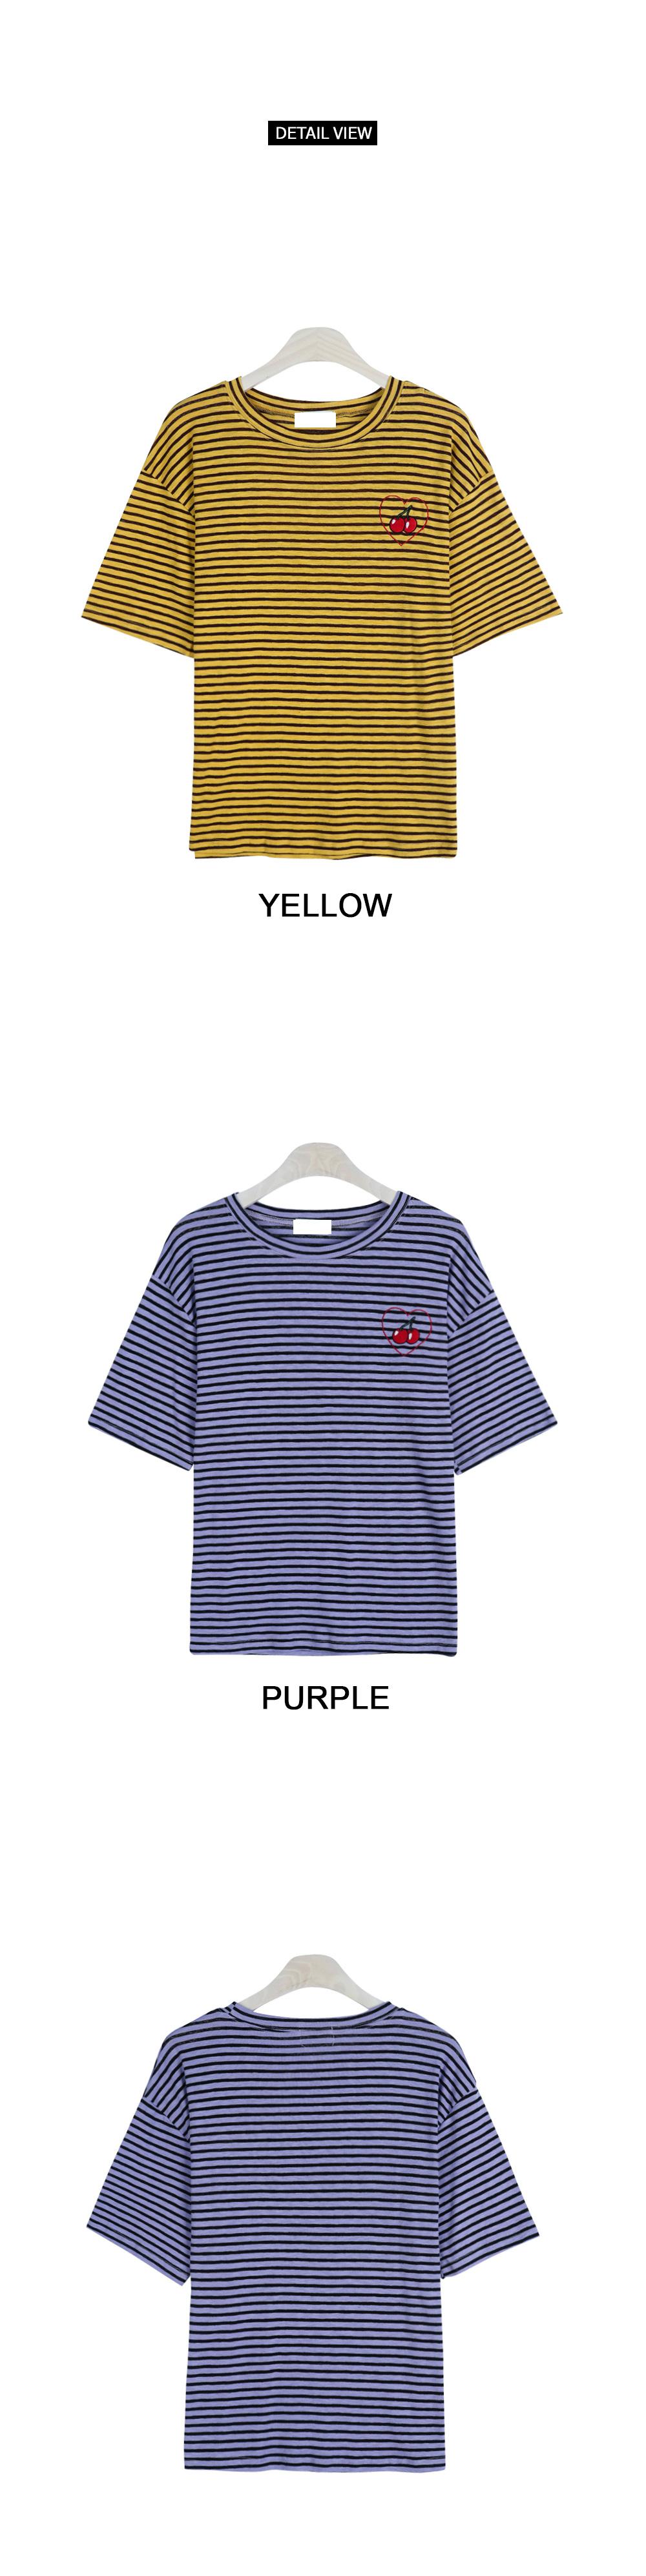 Heart cherry short-sleeved tee (t4635)